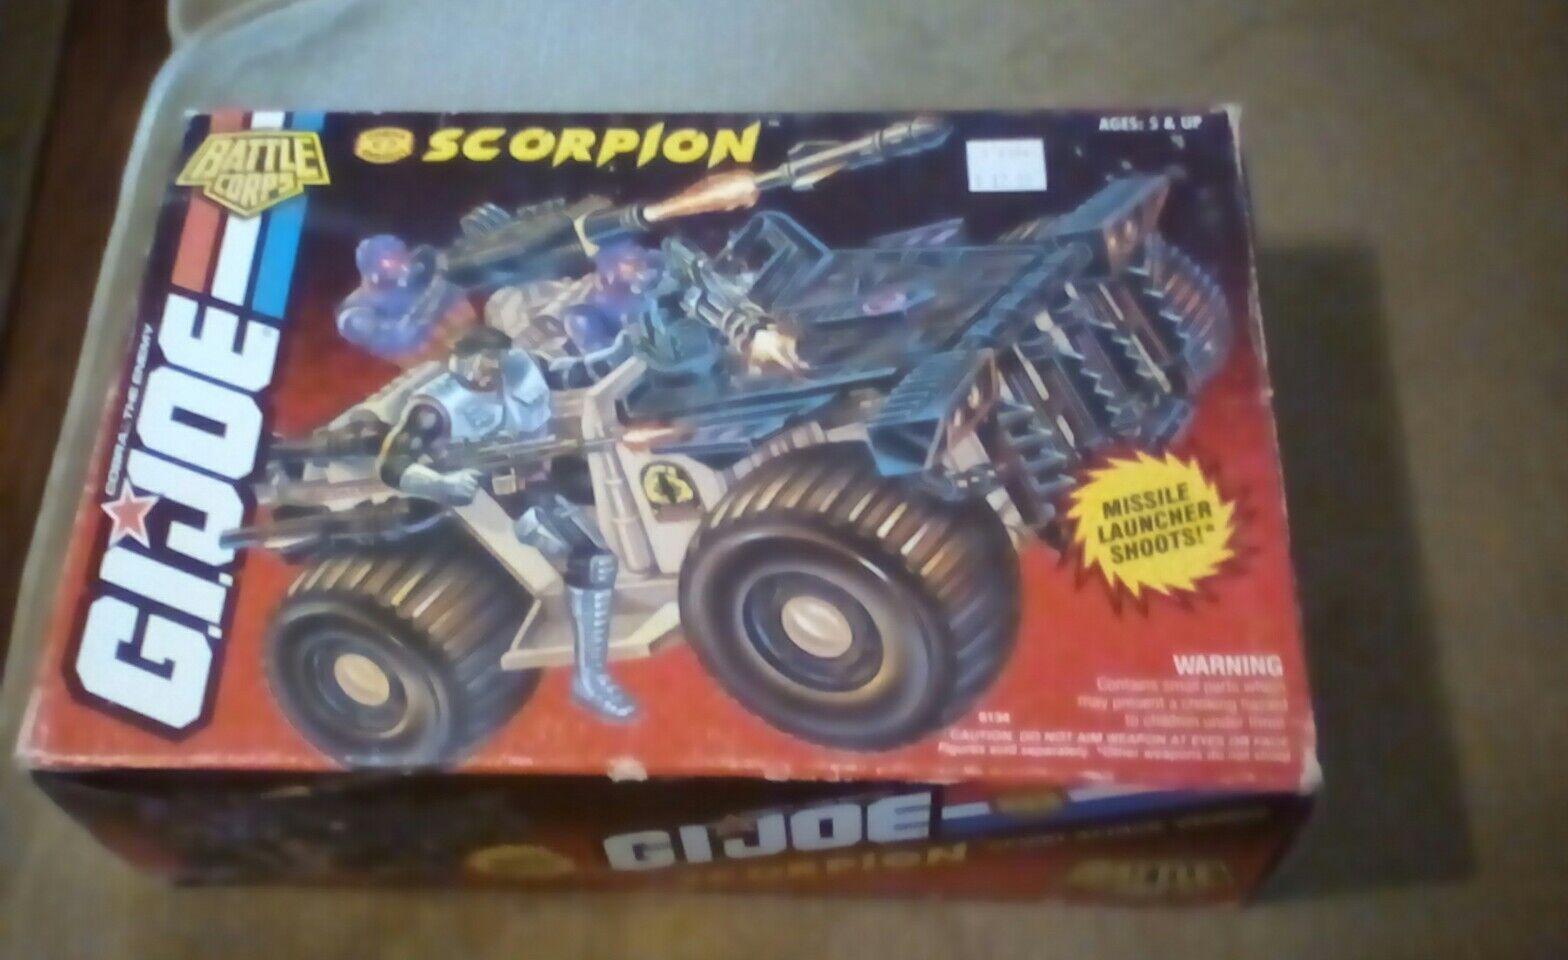 Vintage gijoe vehicle battle corps scorpion 1993 new in box.